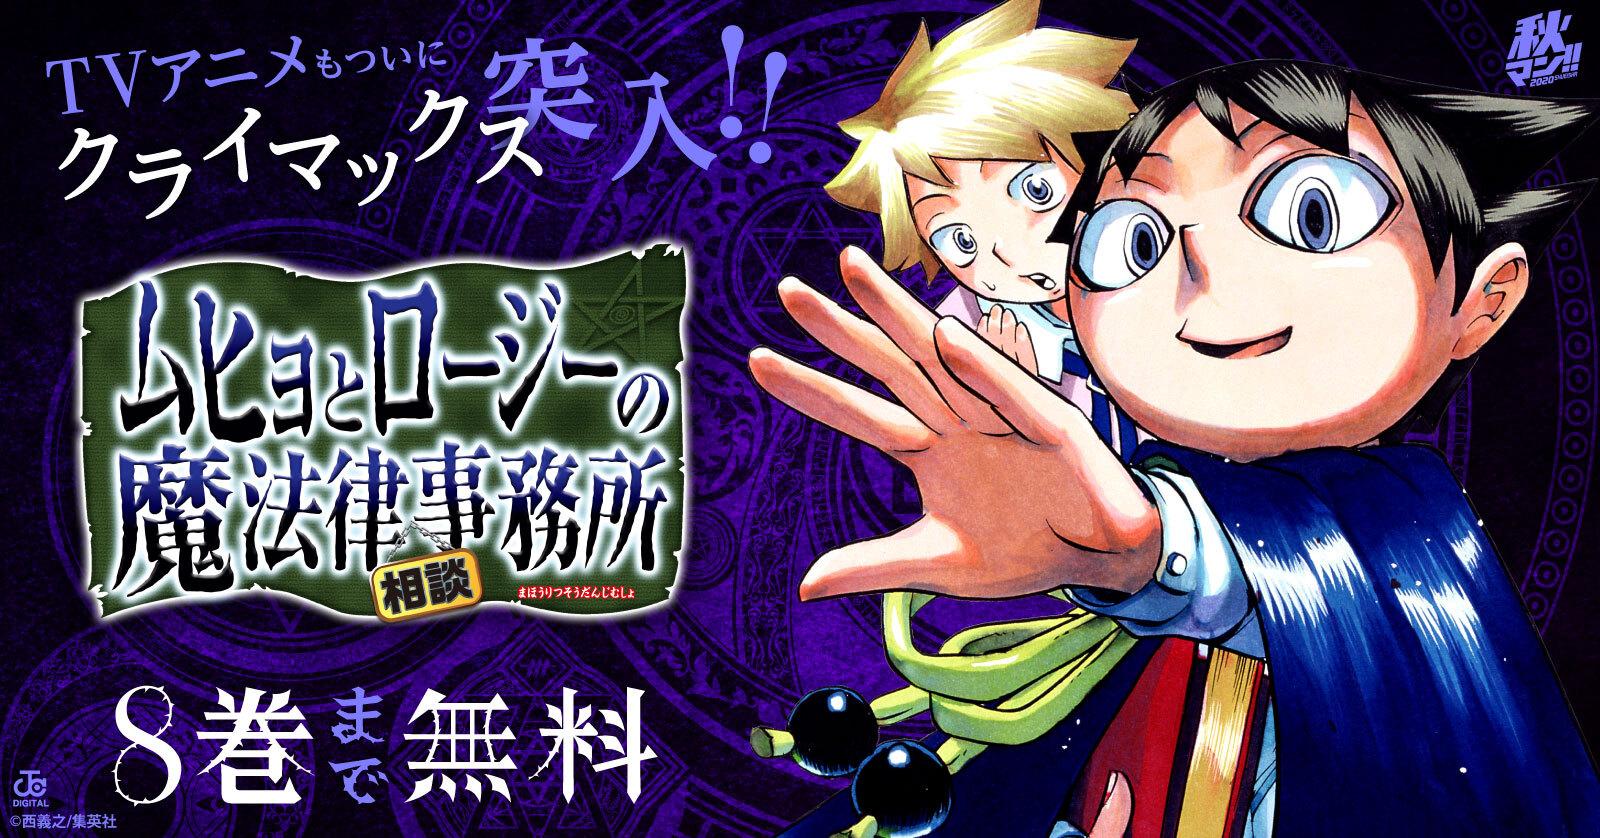 GANTZシリーズ新章開幕!!『GANTZ:E』第1巻発売記念!!シリーズタイトル大量解放キャンペーン!!